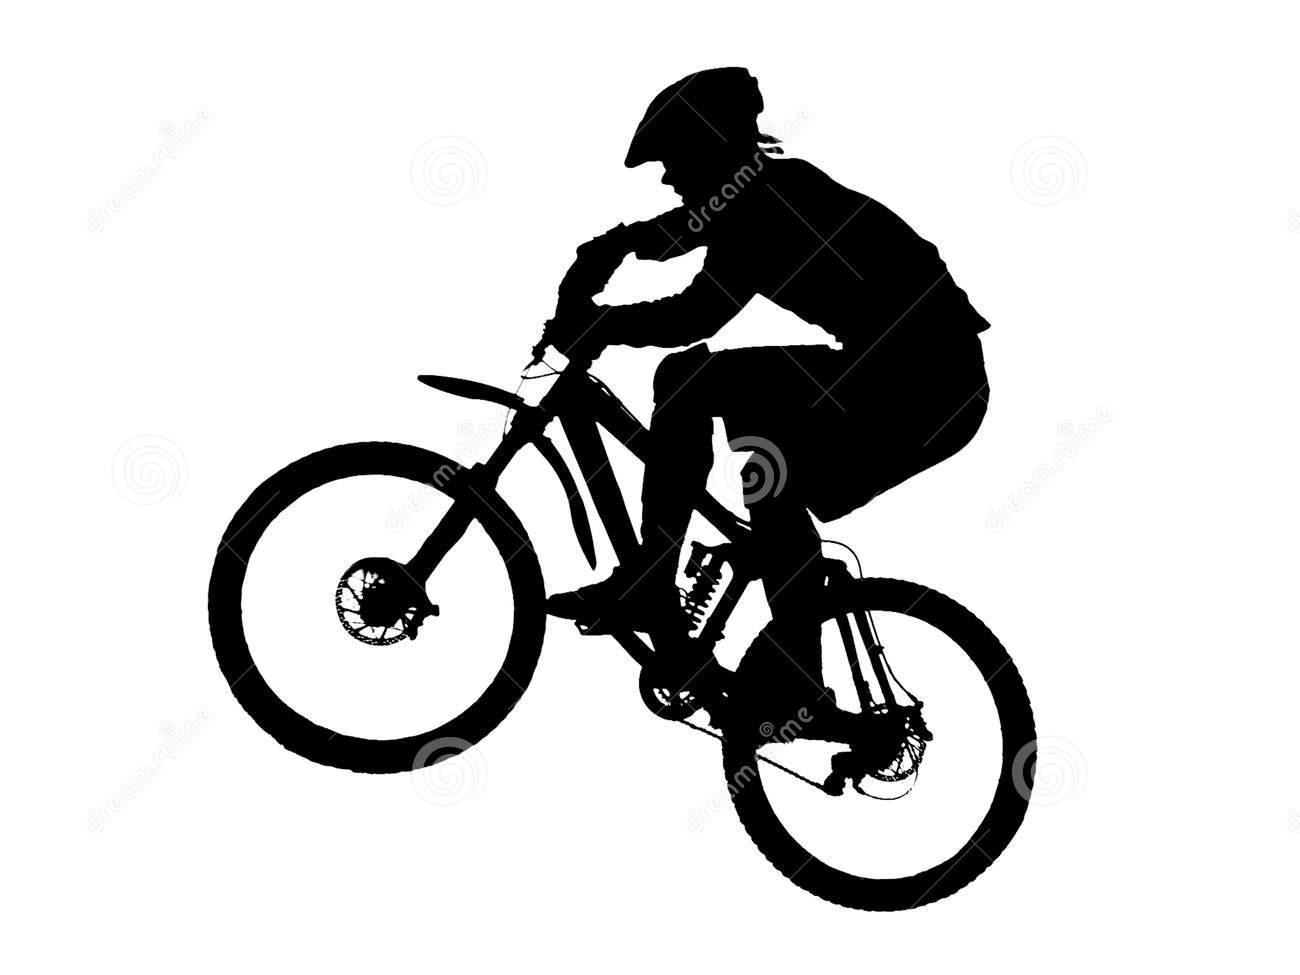 1300x975 Mountain Bike Silhouette Clipart